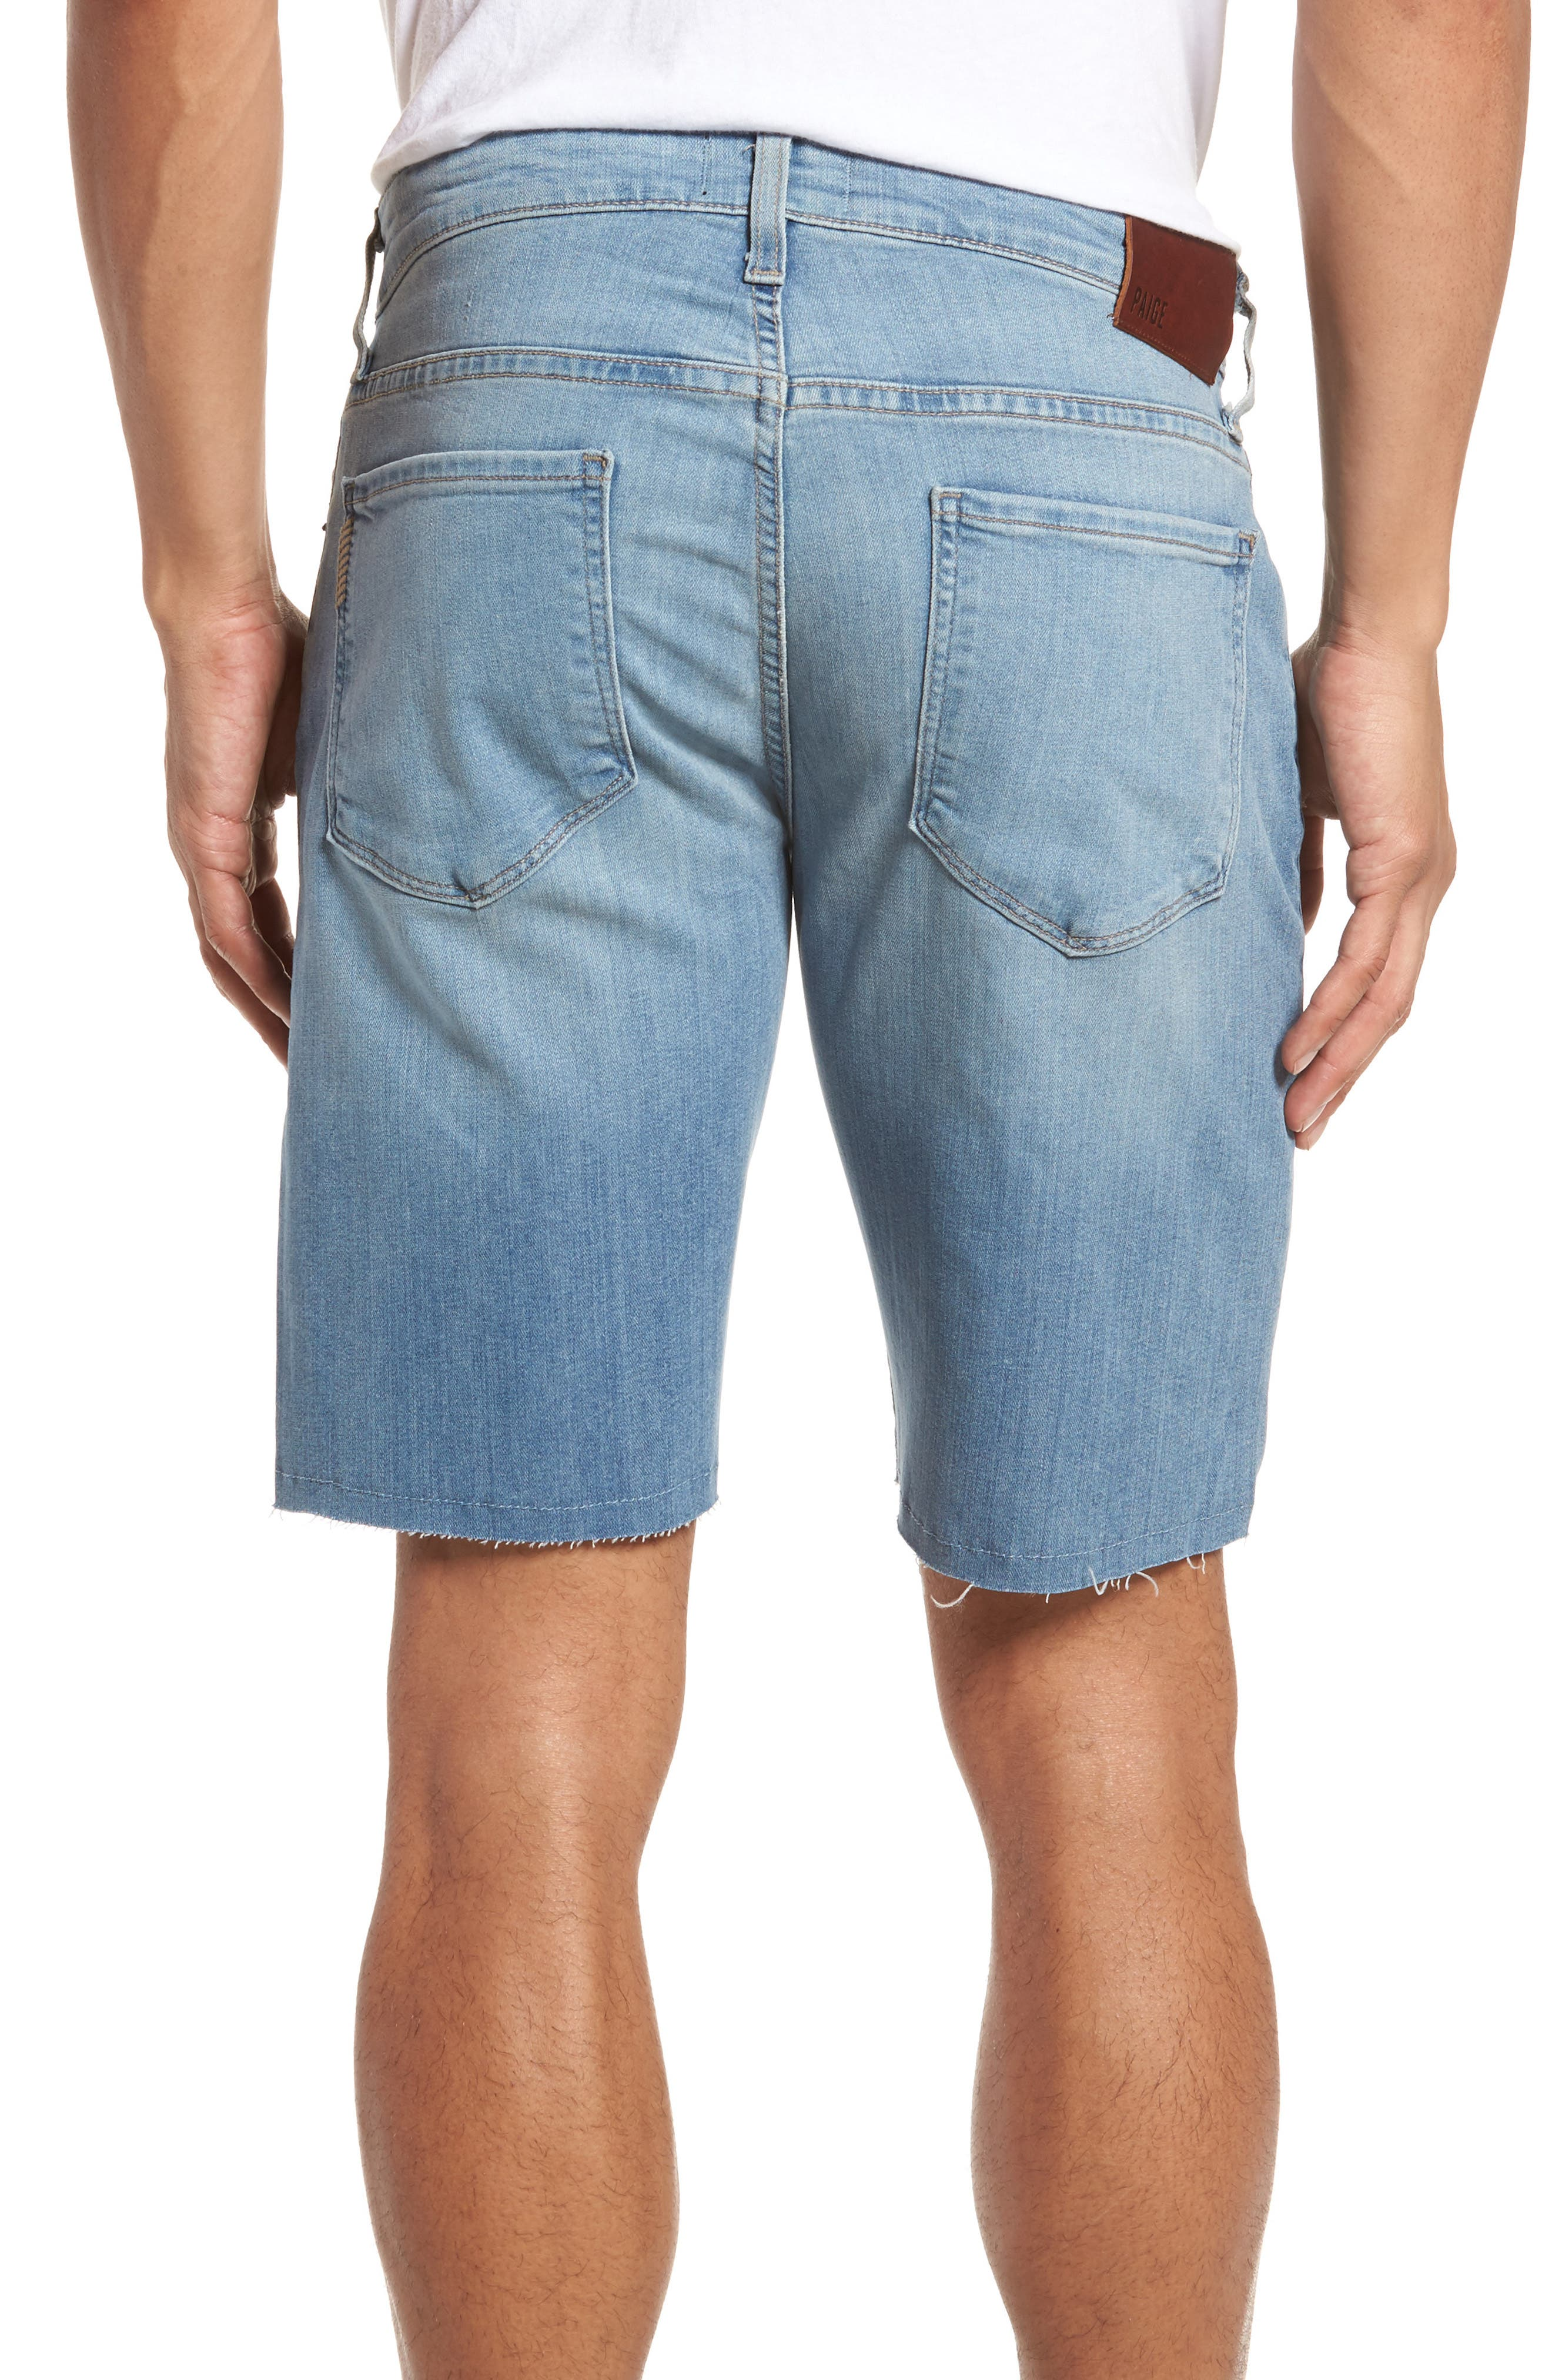 Transcend - Federal Slim Straight Leg Denim Shorts,                             Alternate thumbnail 2, color,                             400